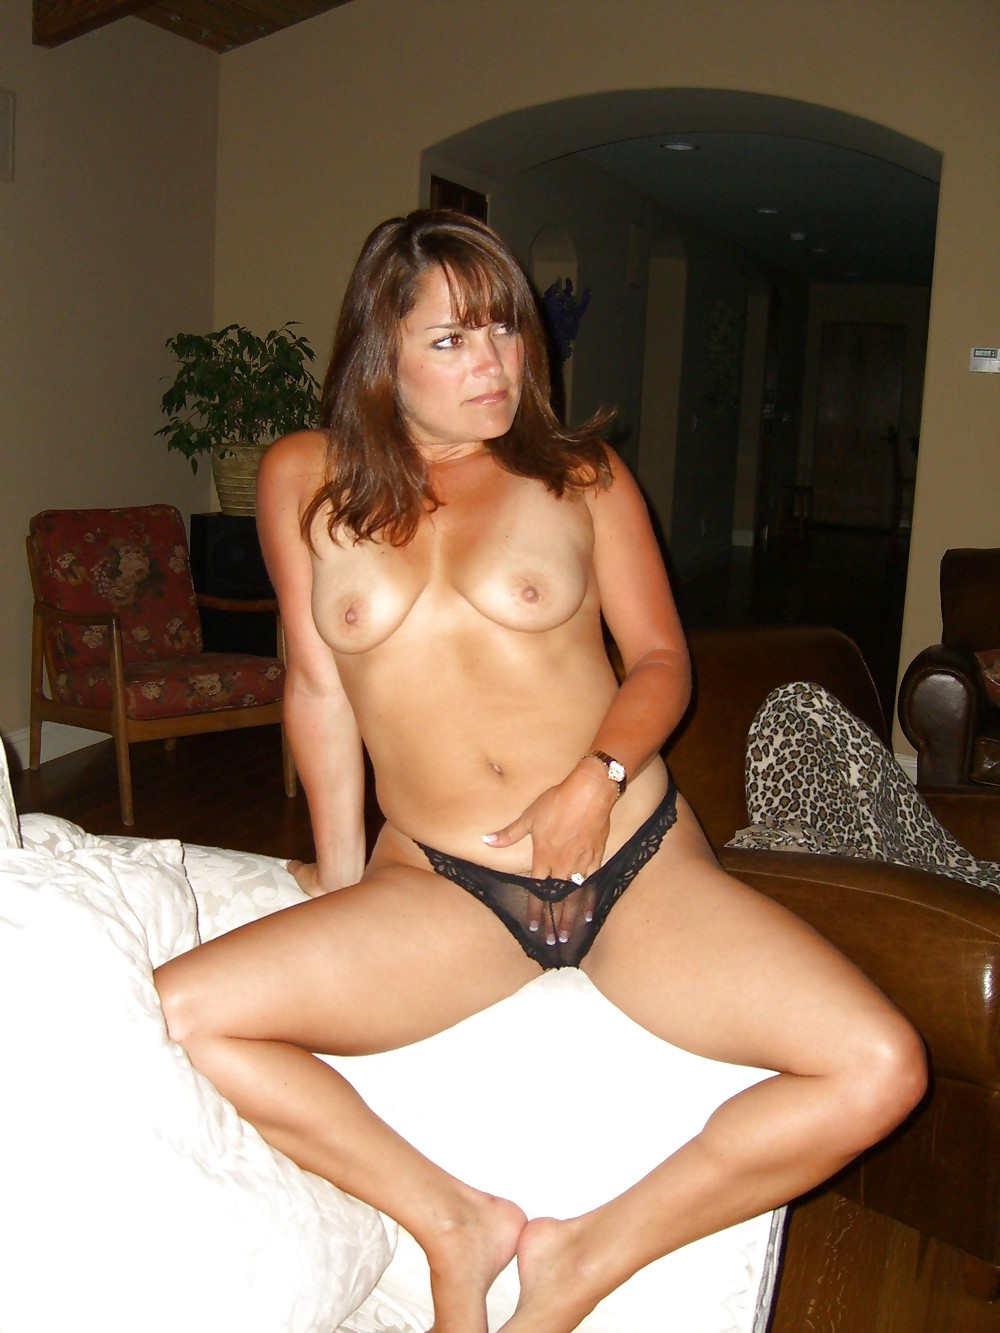 http://hotamateurmature.com/gallery/Housewives_milf_mature_elders/13.jpg